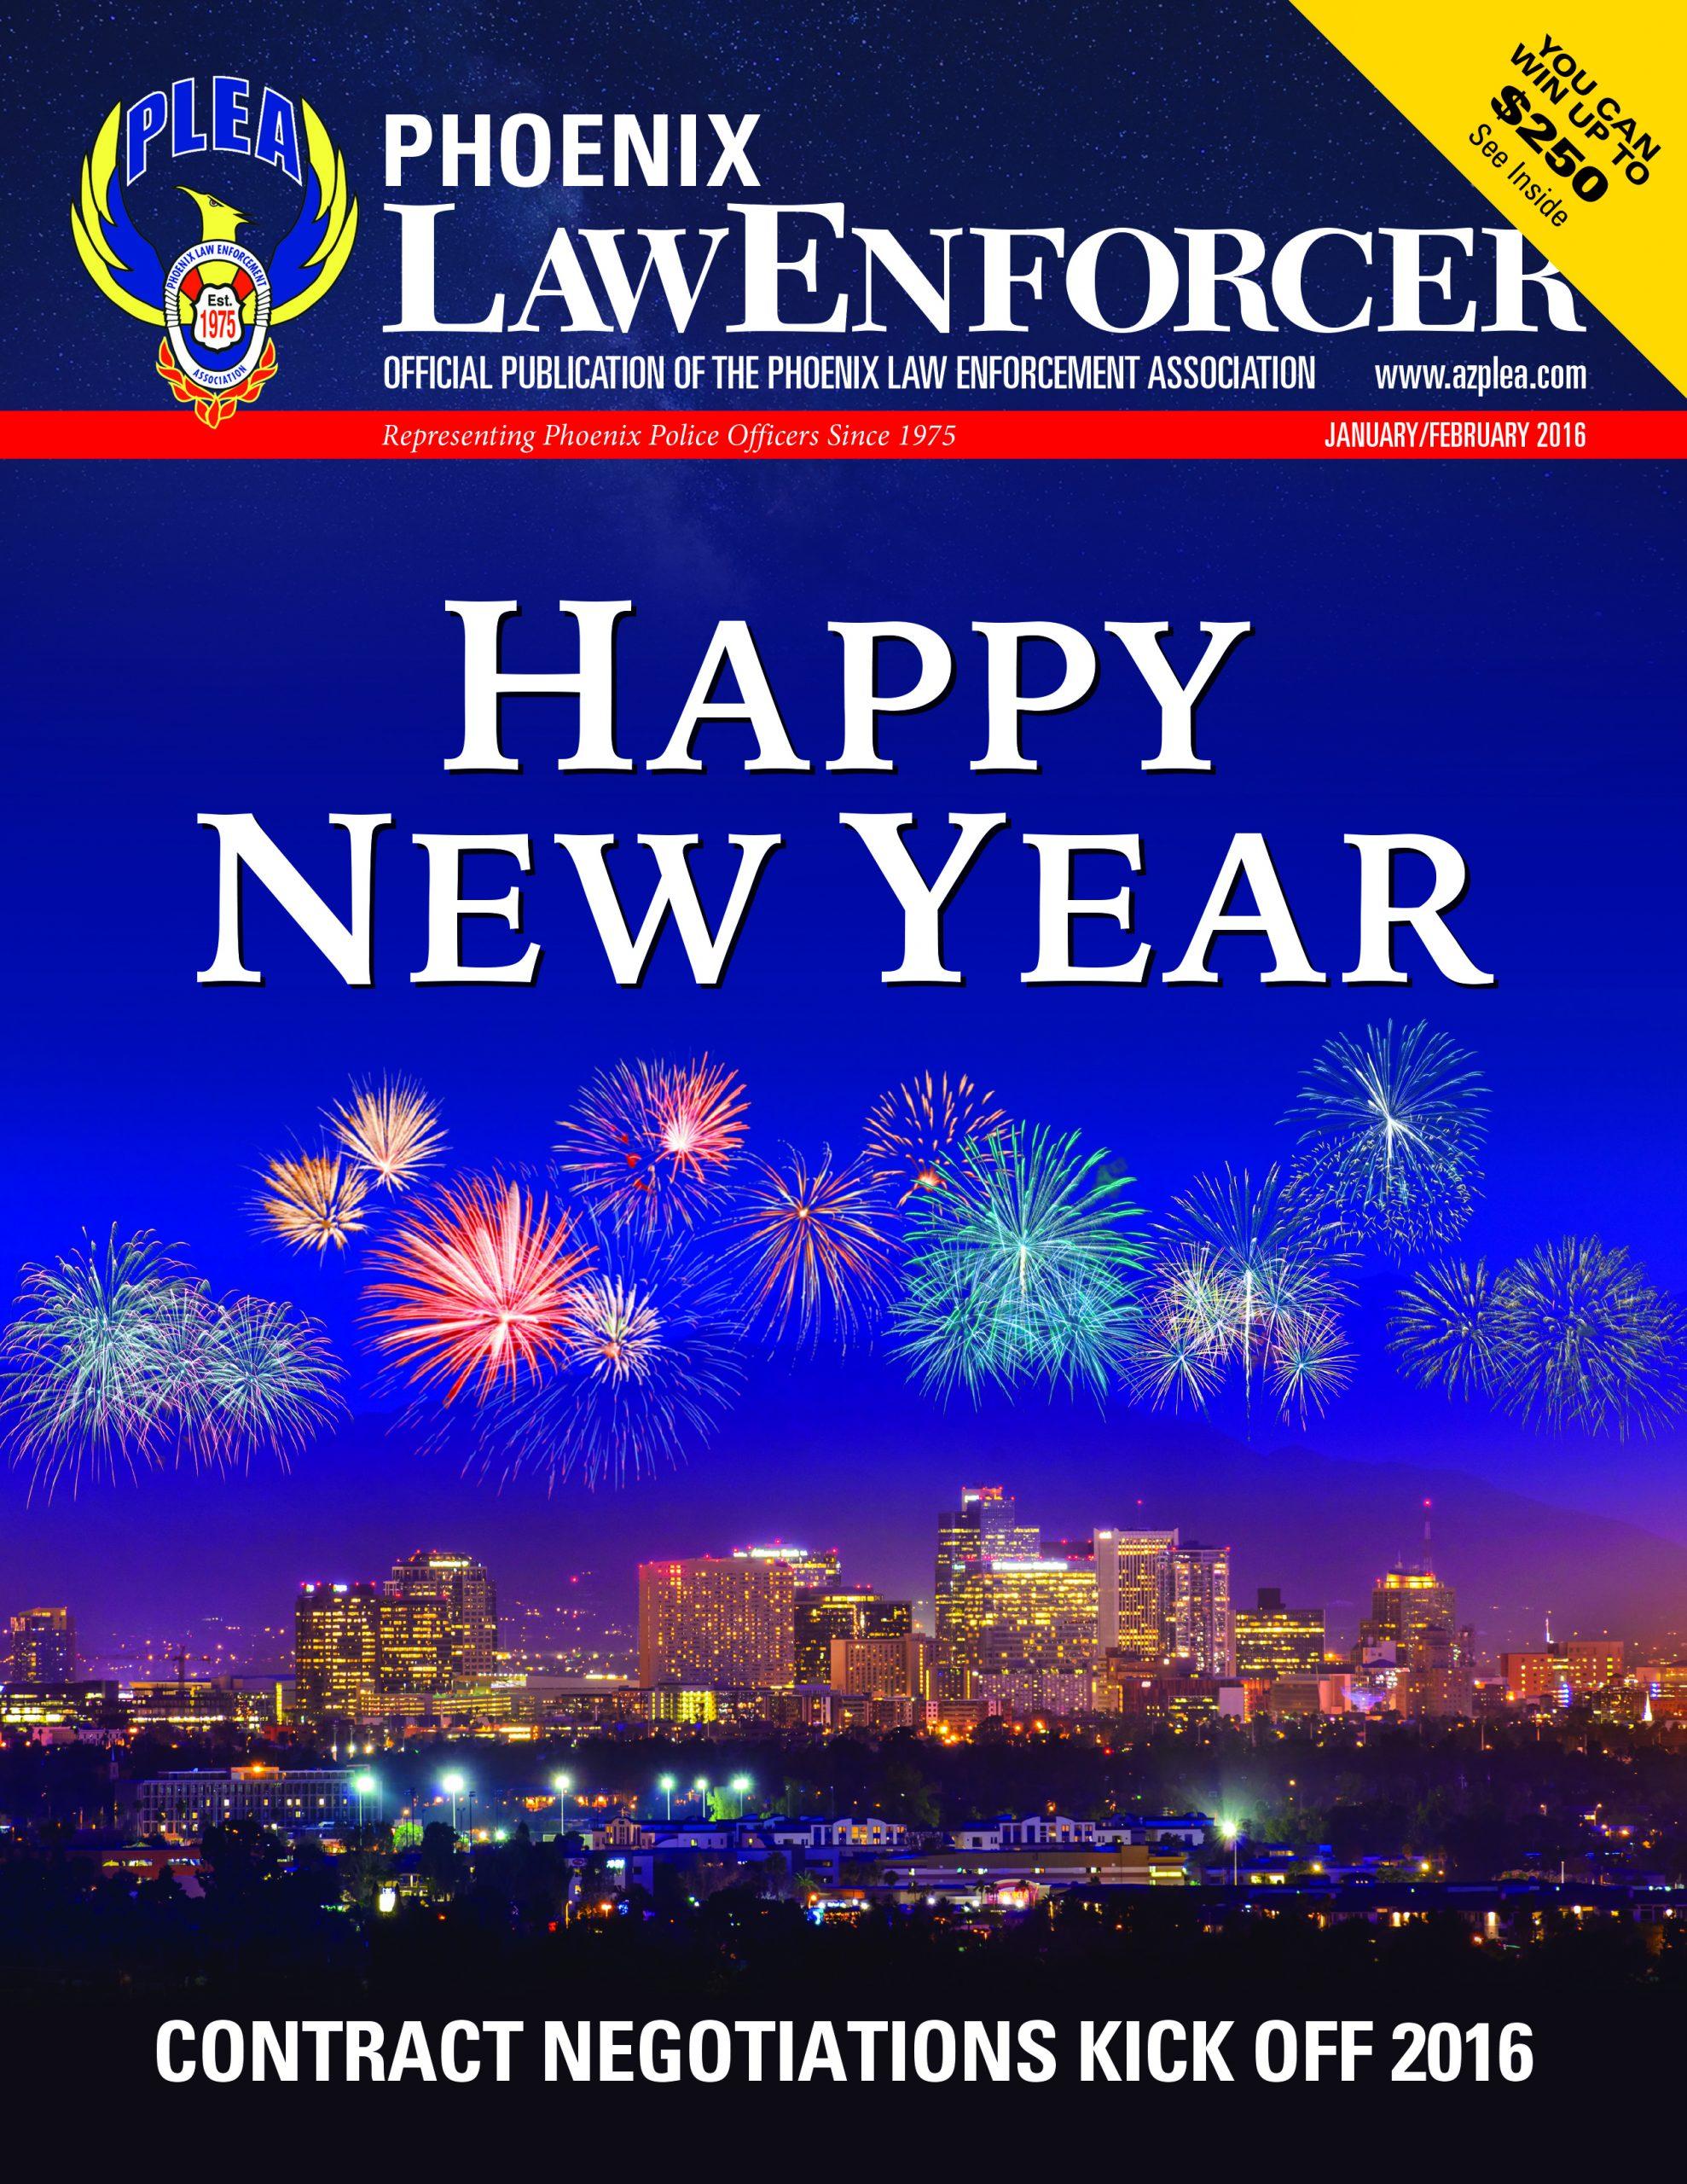 Phoenix Law Enforcer – January/February 2016